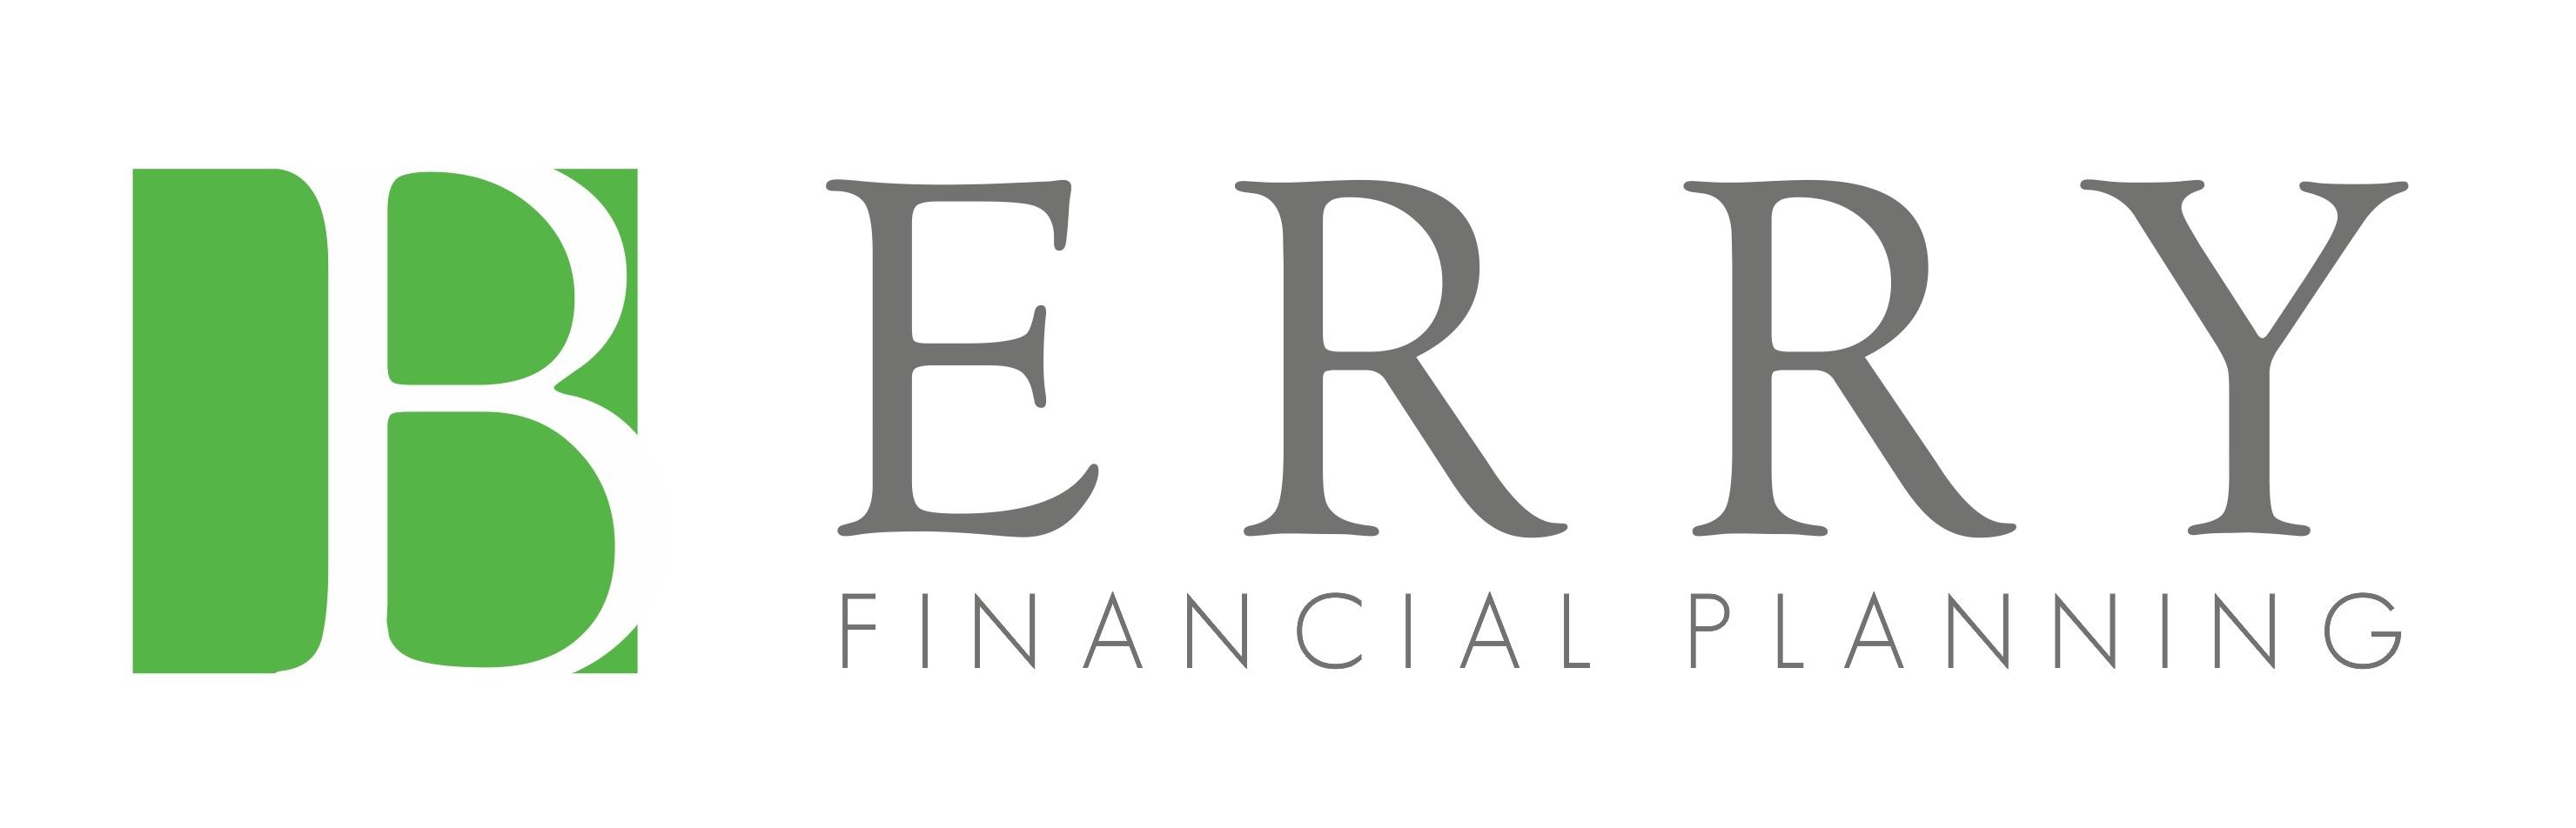 Berry Financial Planning Ltd